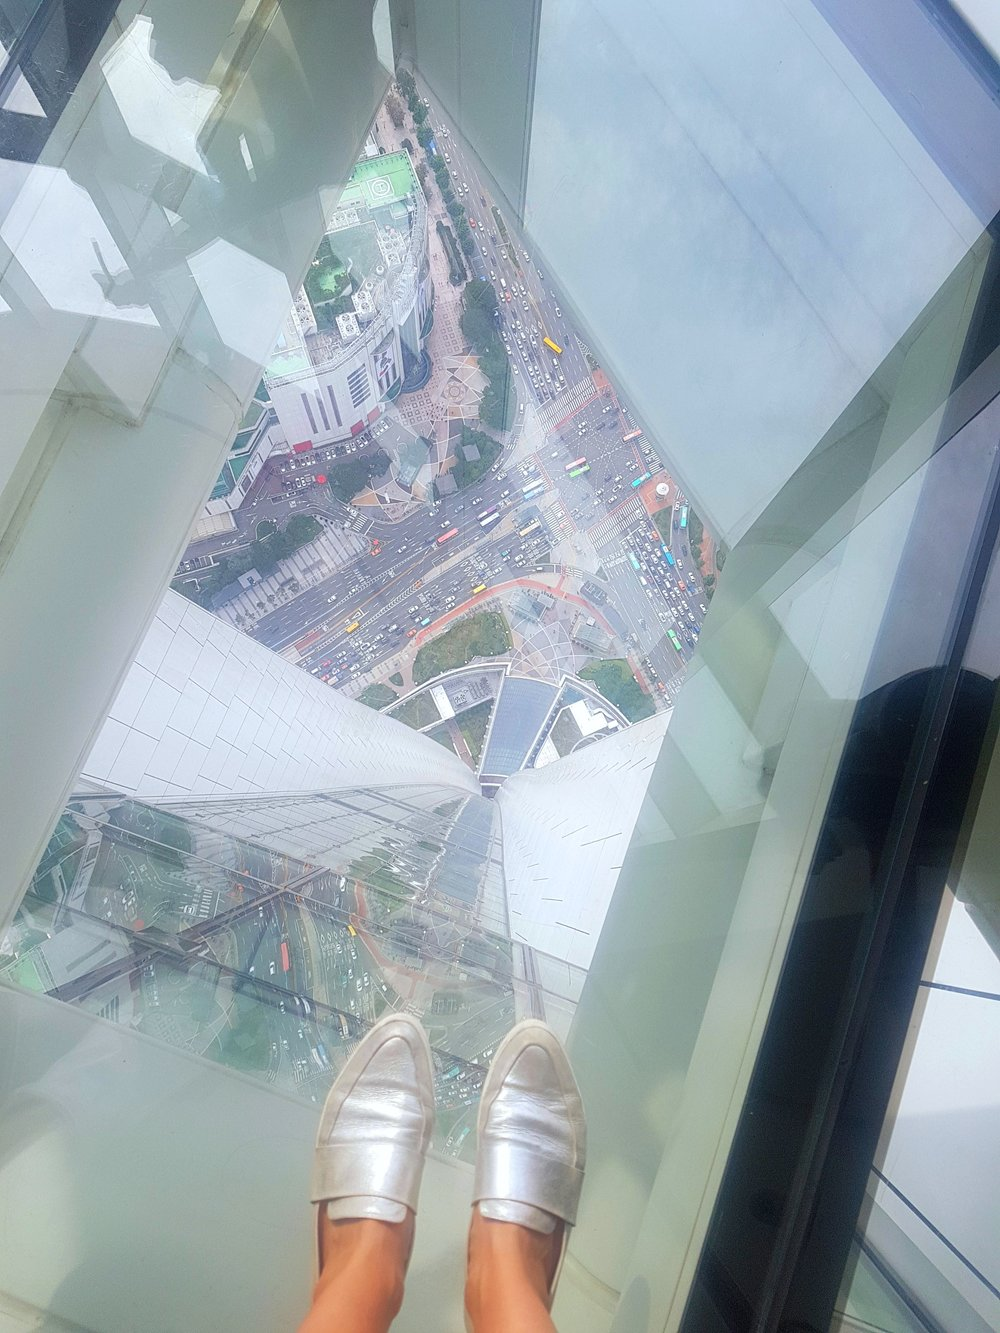 highplaces.jpg